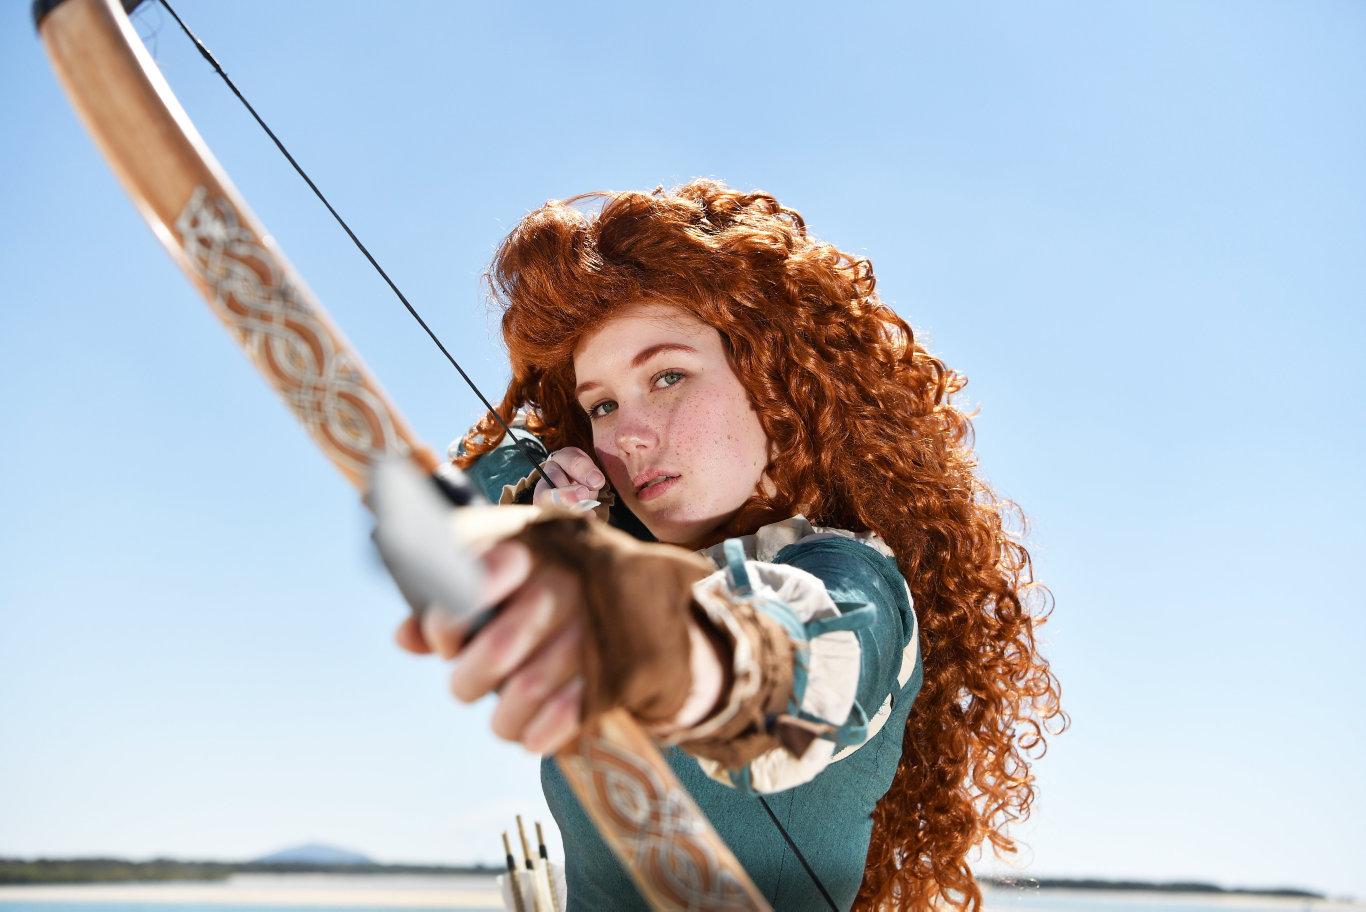 Natasha Jade as Merida from Disney's Brave. Photo: Patrick Woods